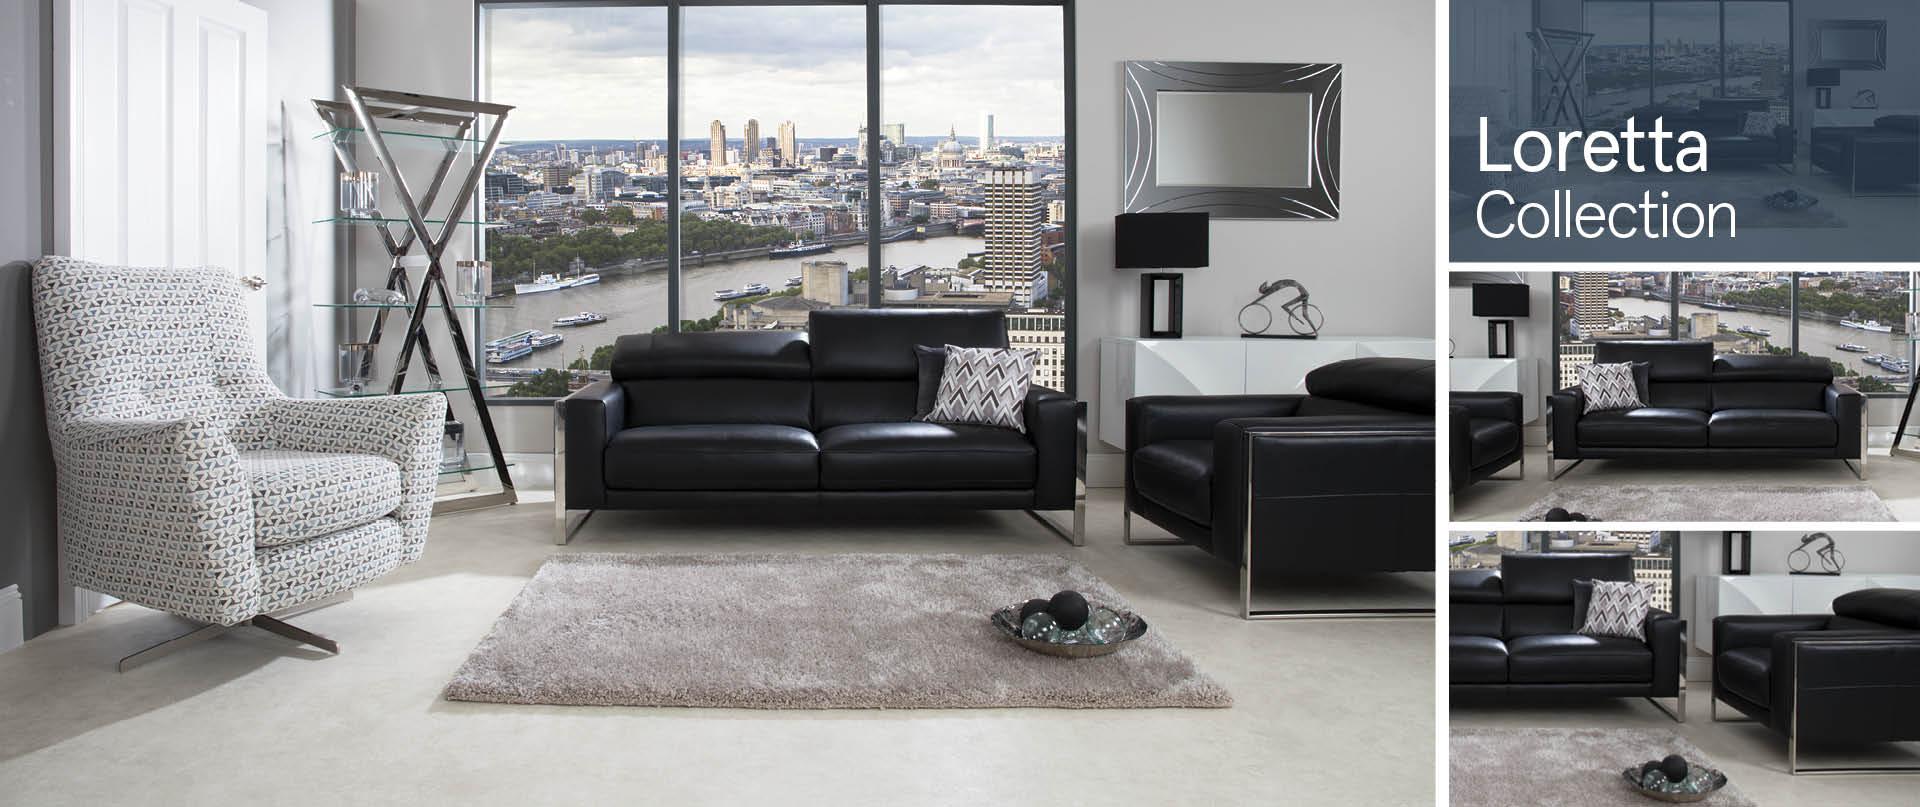 Loretta All Leather Sofa Ranges